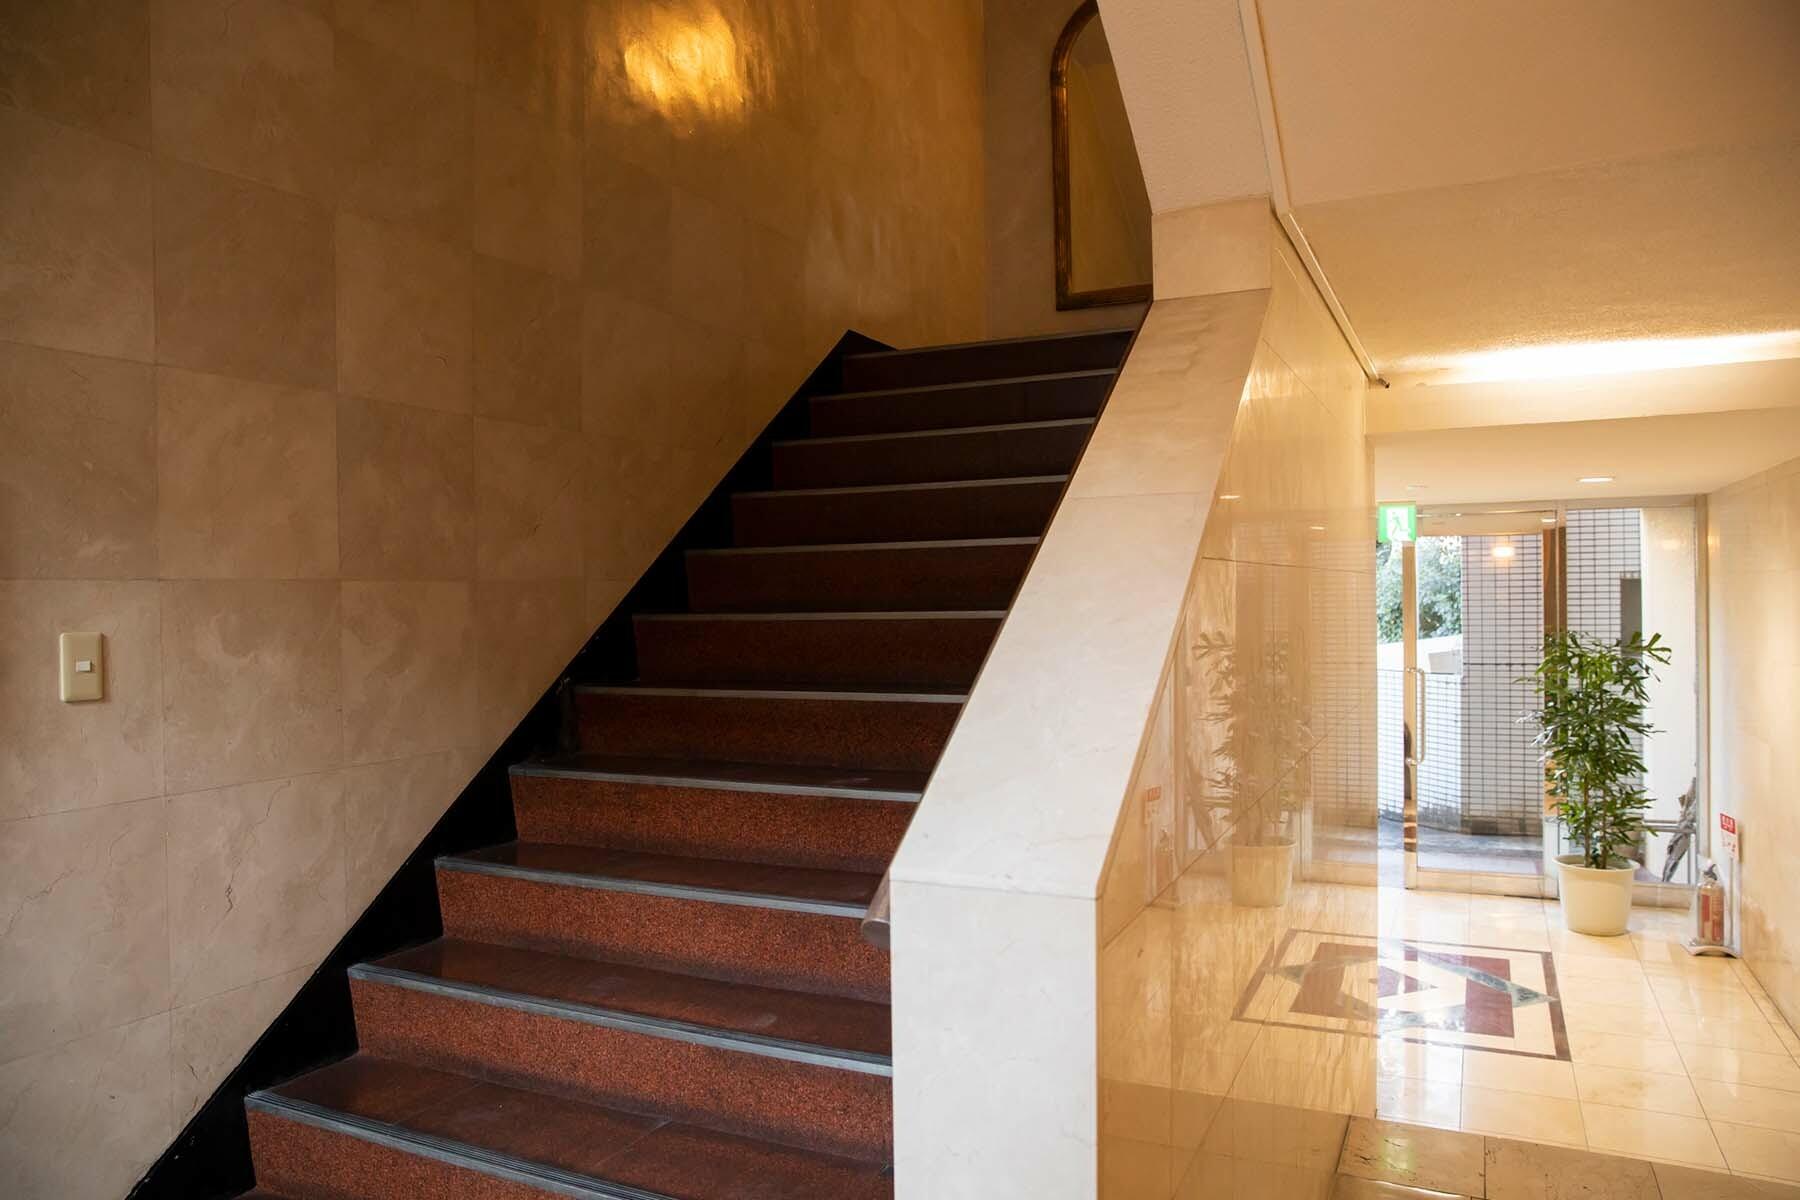 STUDIO NONAMES MEJIRO (スタジオ ノナメス メジロ)共用部 廊下